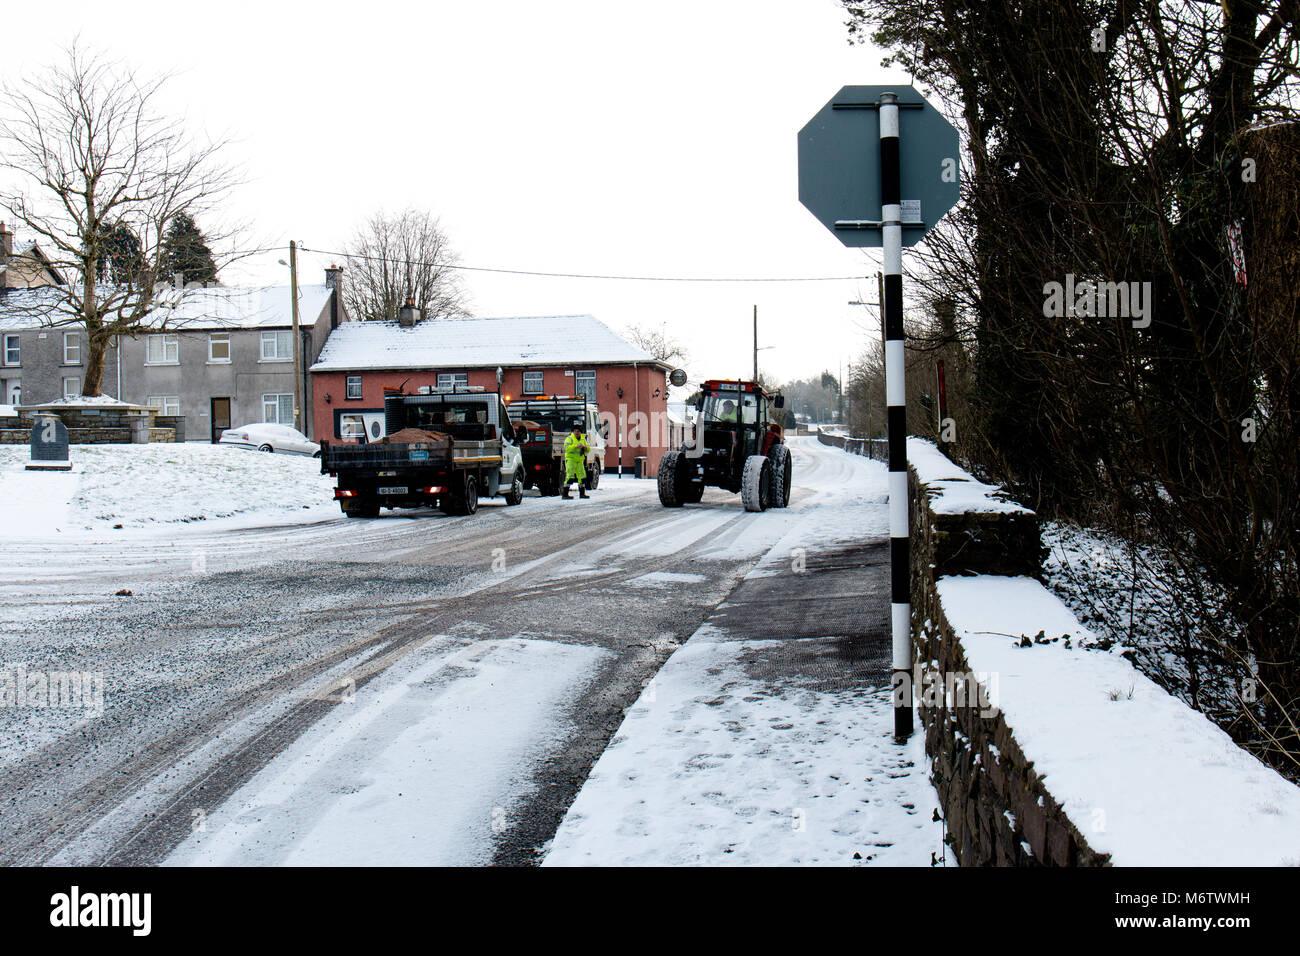 New Look Jobs in Carrignavar, County Cork - January 2020